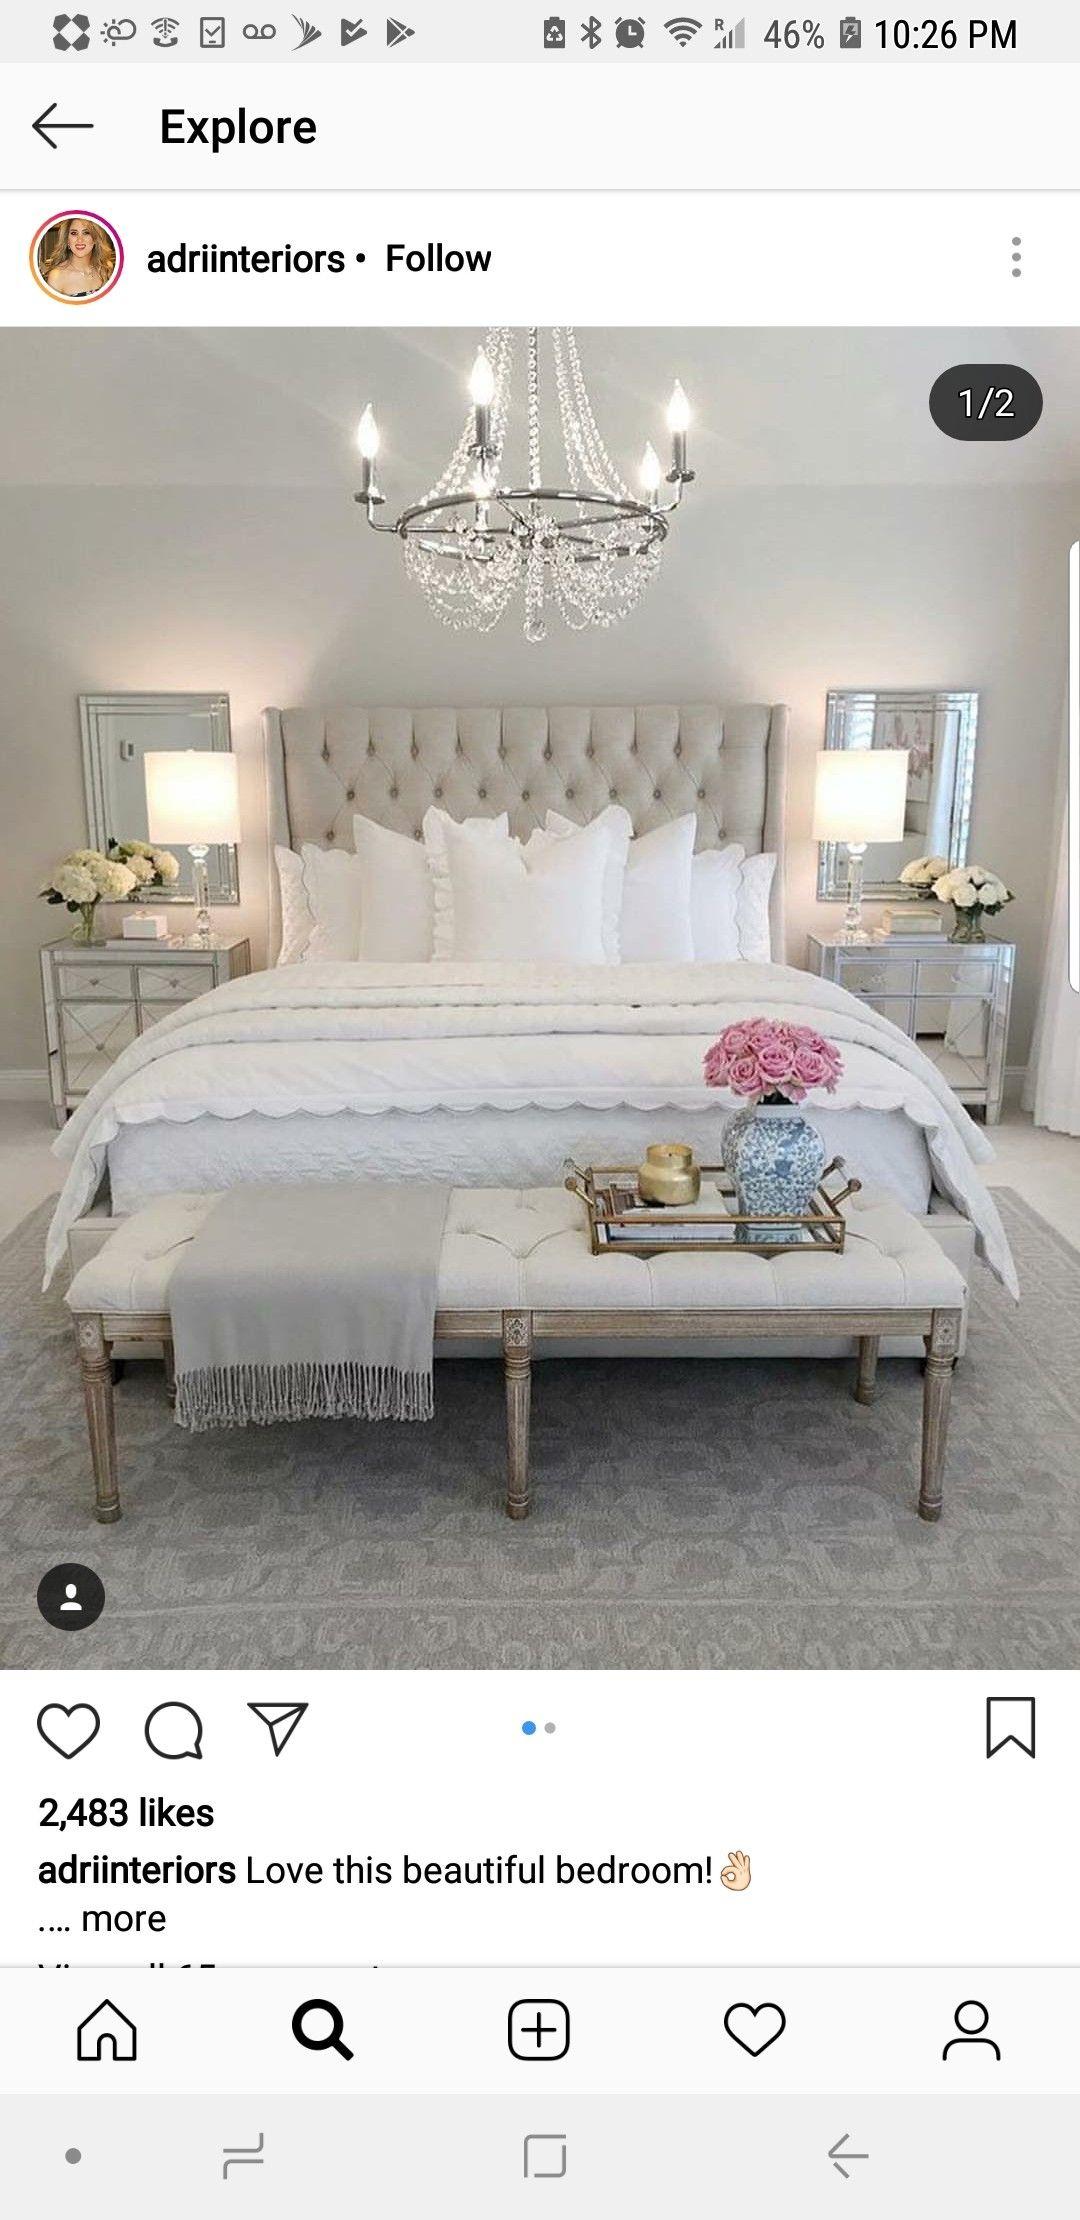 Pin by kyndra dixon on bedroom ideas in pinterest bedroom